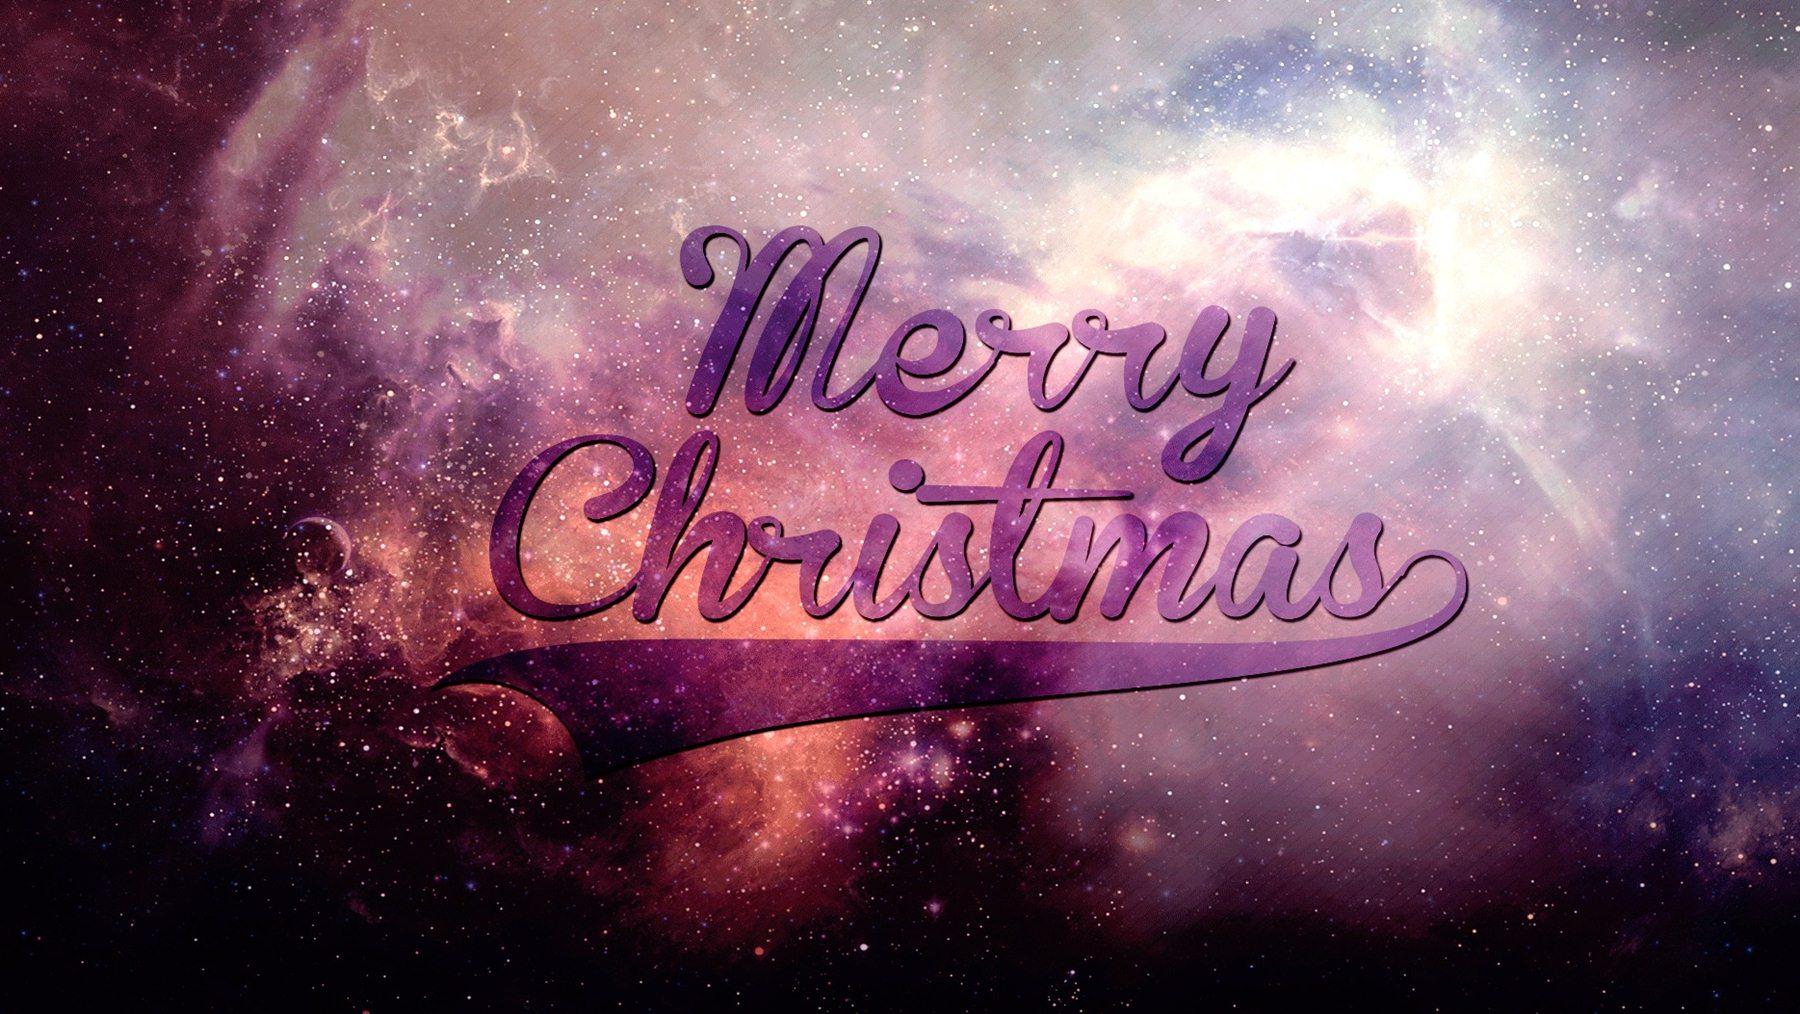 Dyfi Hd Wallpaper - Full Hd Merry Christmas , HD Wallpaper & Backgrounds